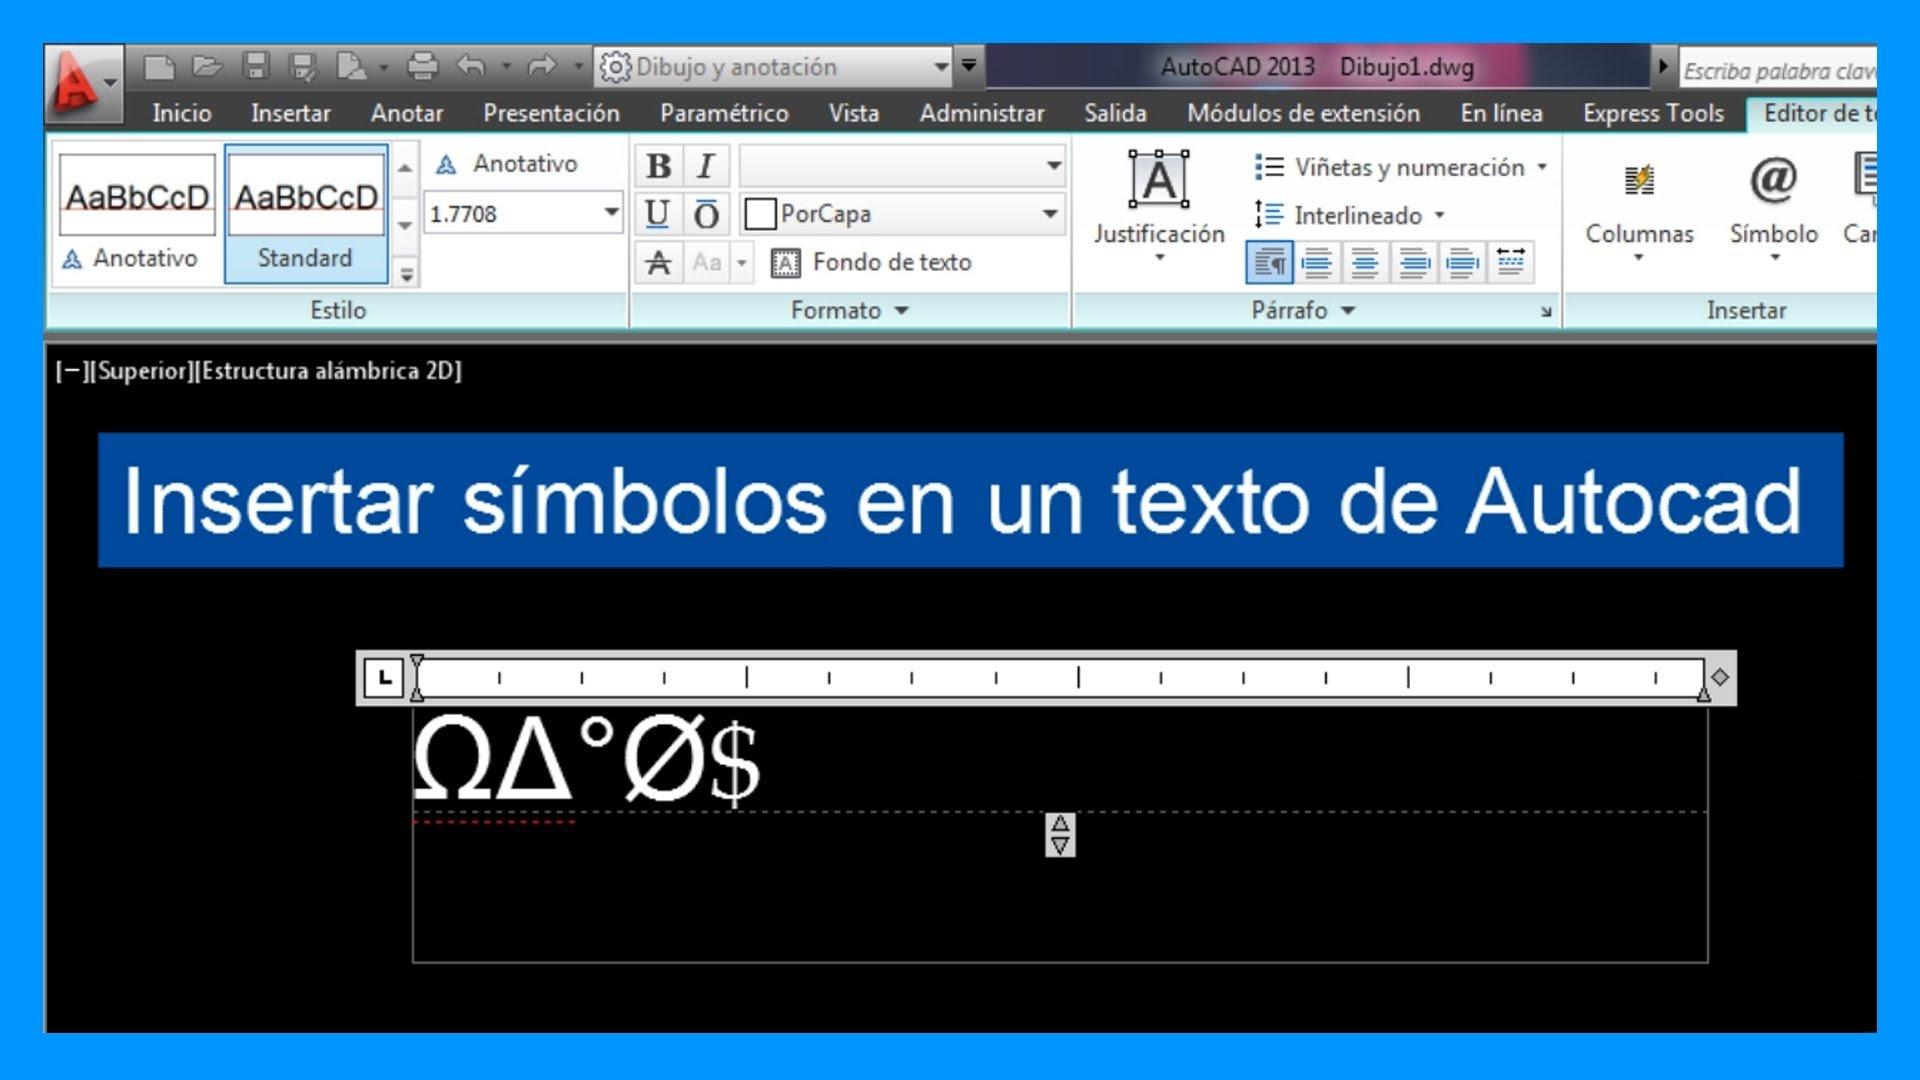 Autocad – Insertar símbolos en texto. Introducir símbolos en Autocad.